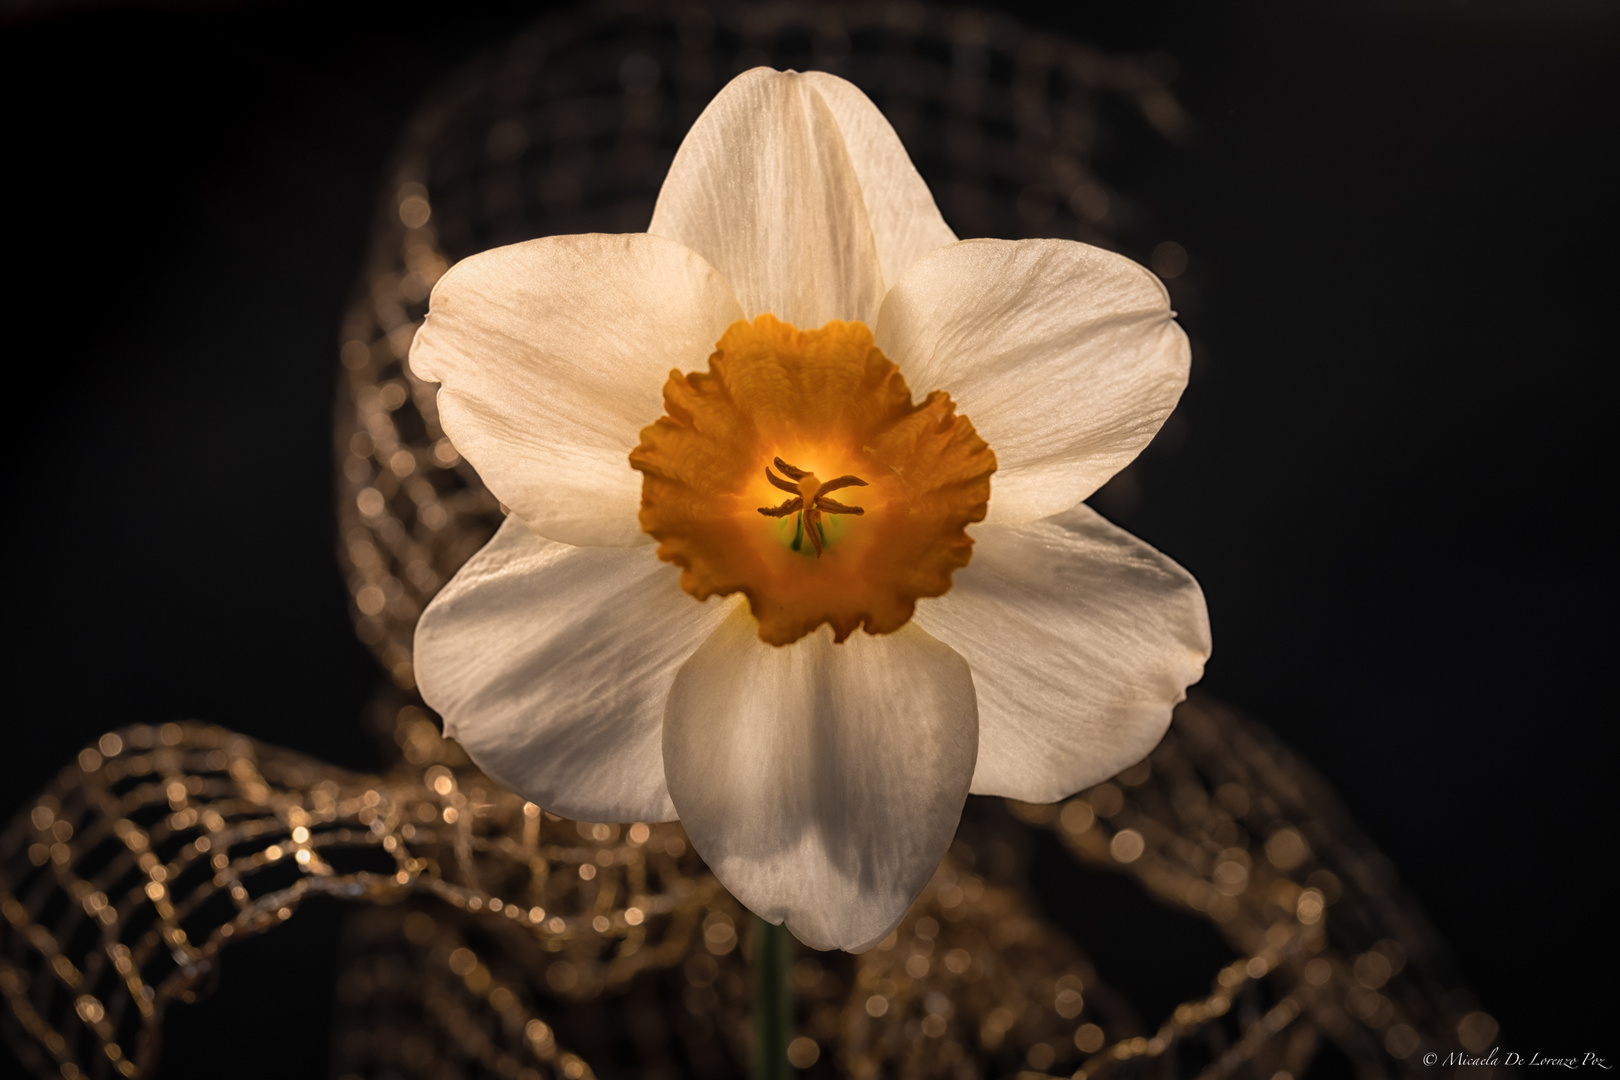 Daffodil, Backlight, Experimenting